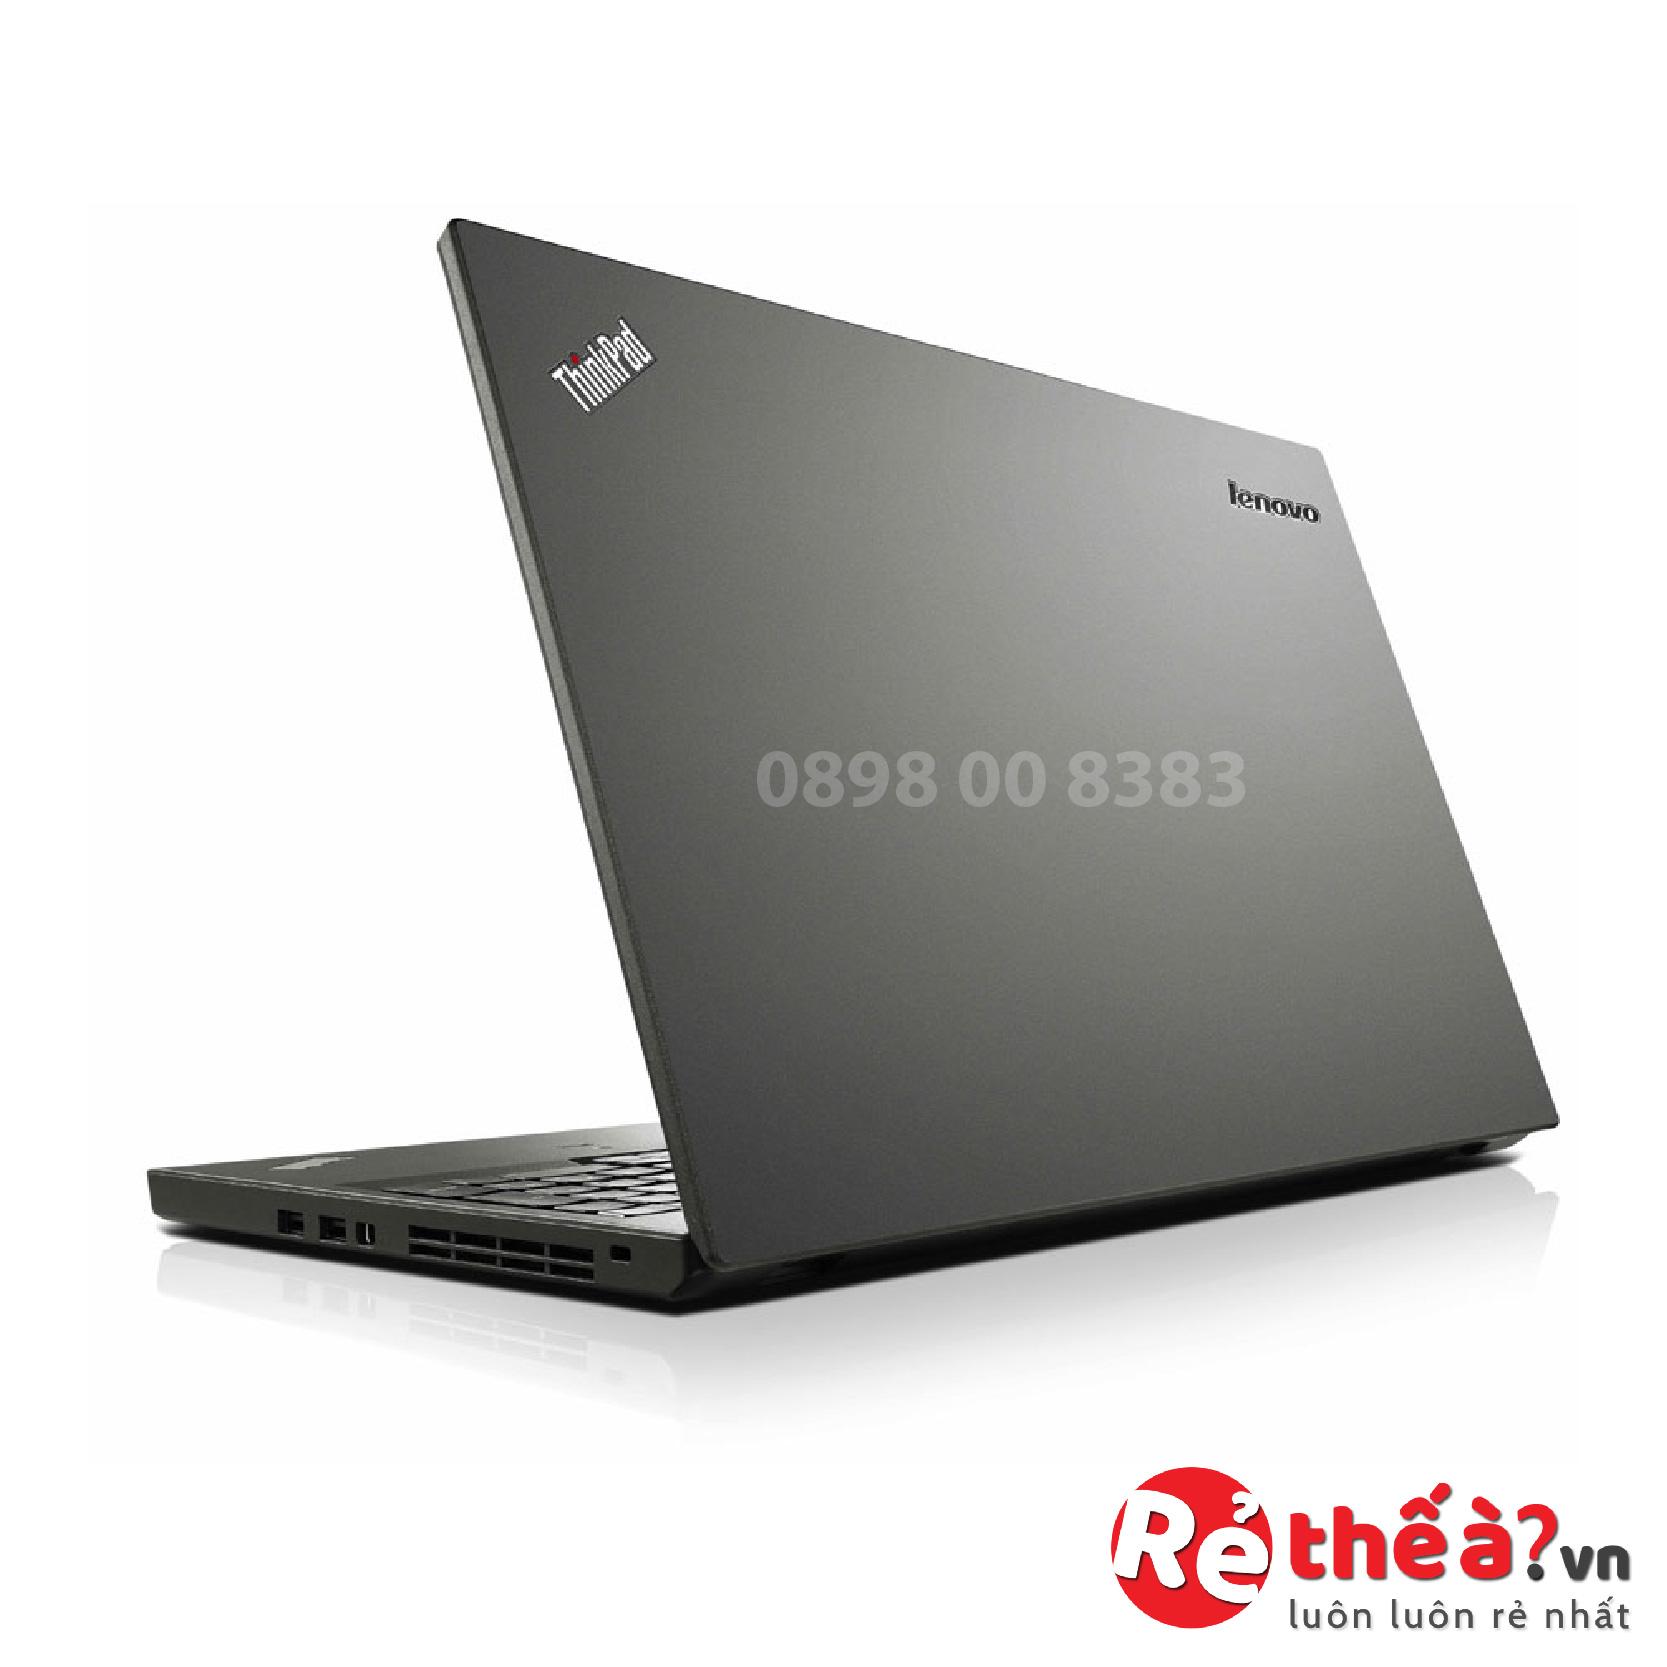 Laptop Lenovo Thinkpad W550s